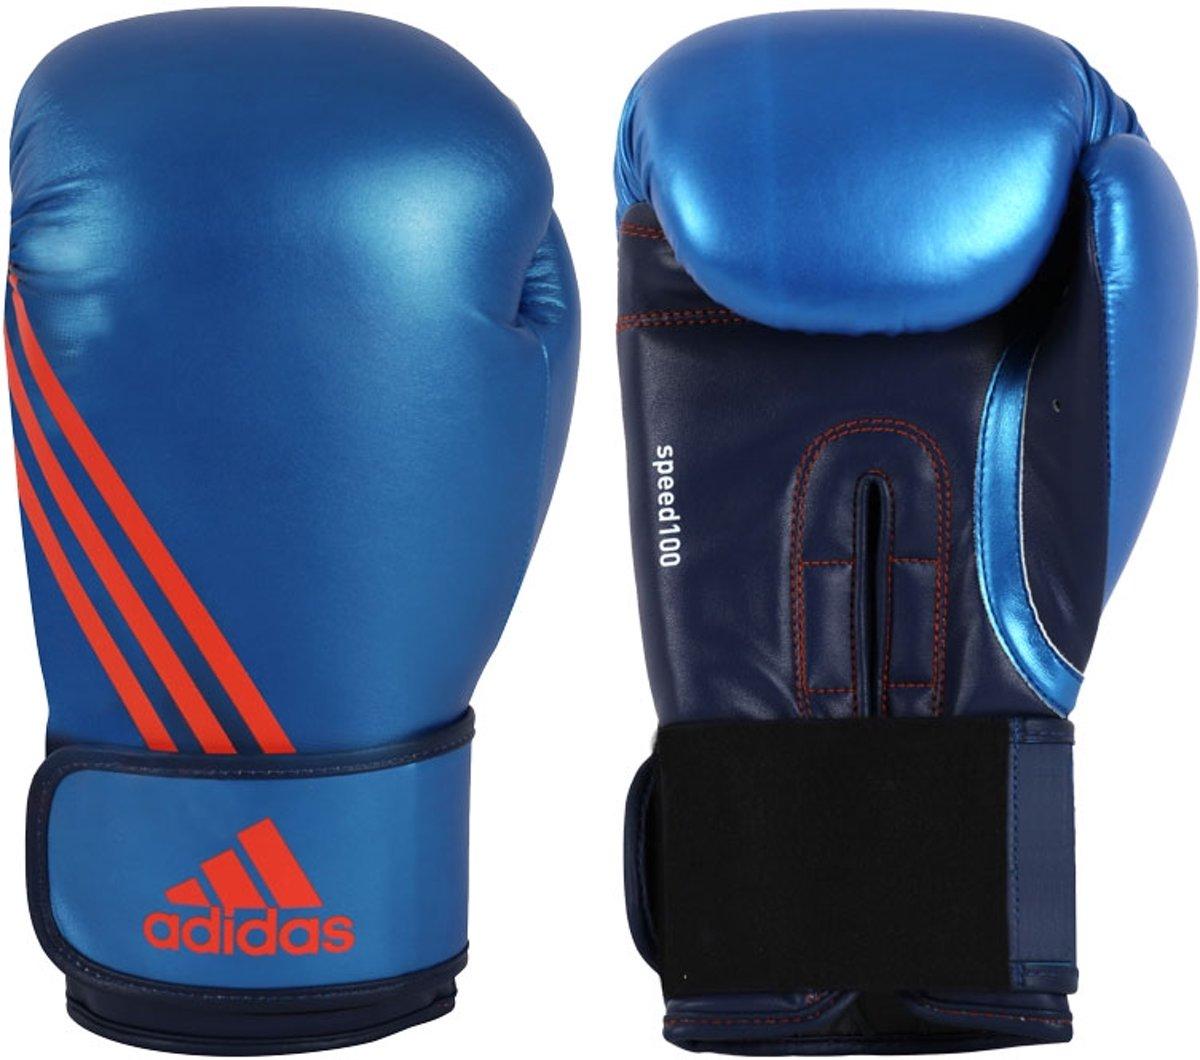 Adidas Speed 100 (Kick)Bokshandschoenen Blauw - 8 oz